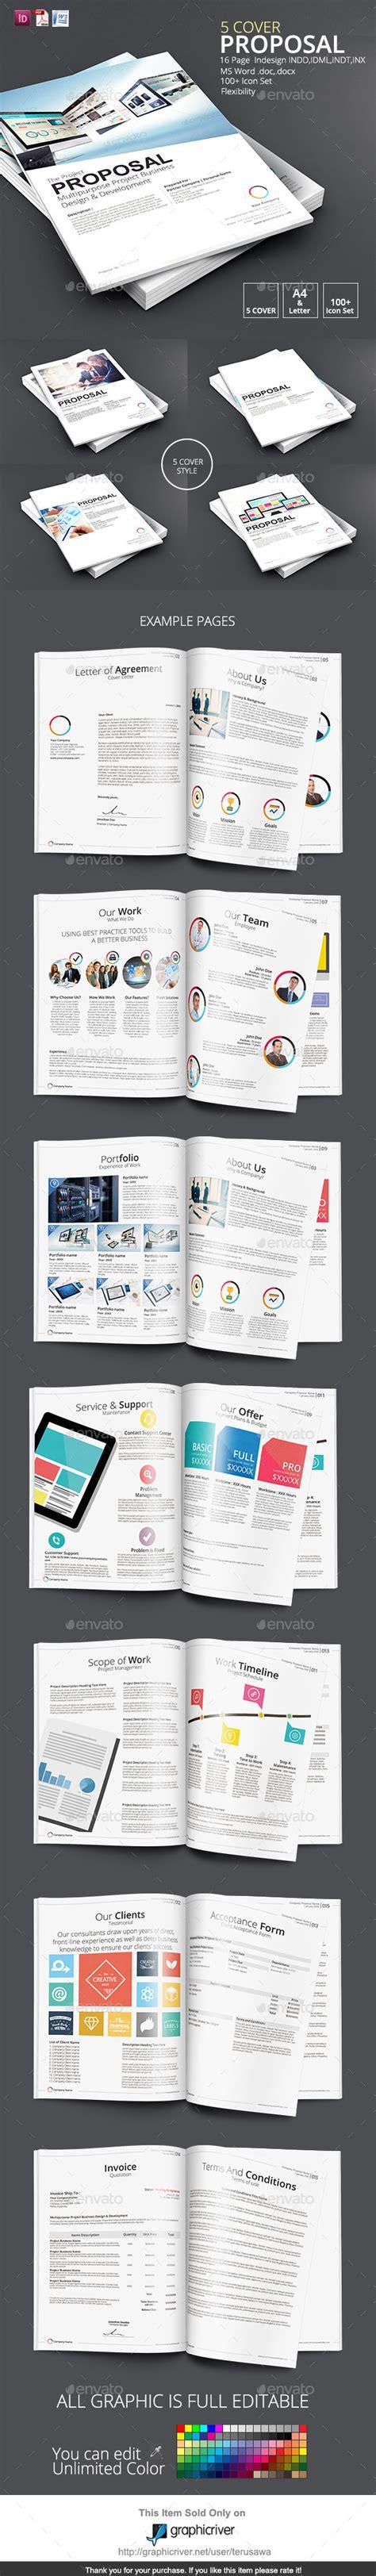 contoh proposal desain interior contoh business plan desain grafis contoh m